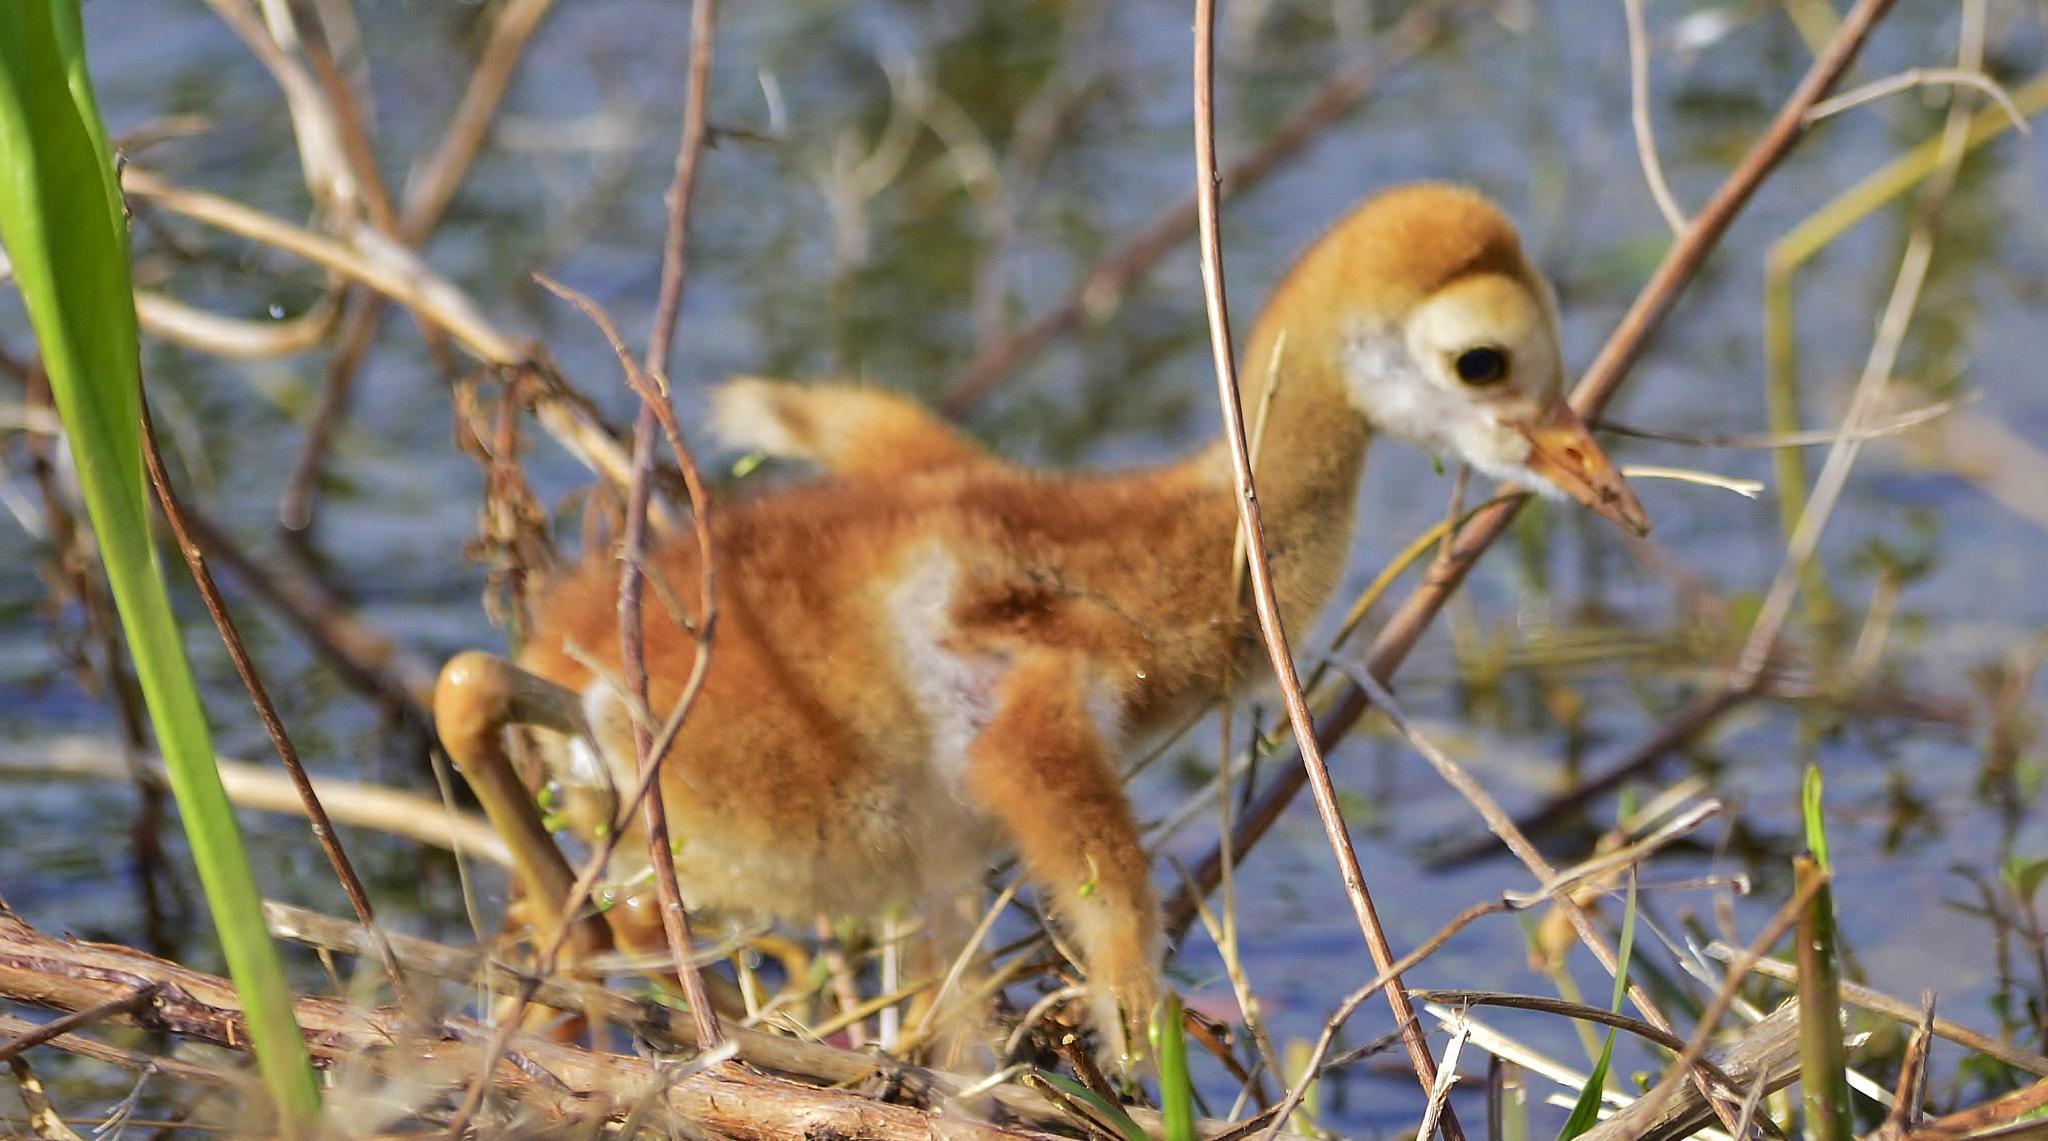 Baby Sandhill Crane Stumbling a Little by jamie.dorton